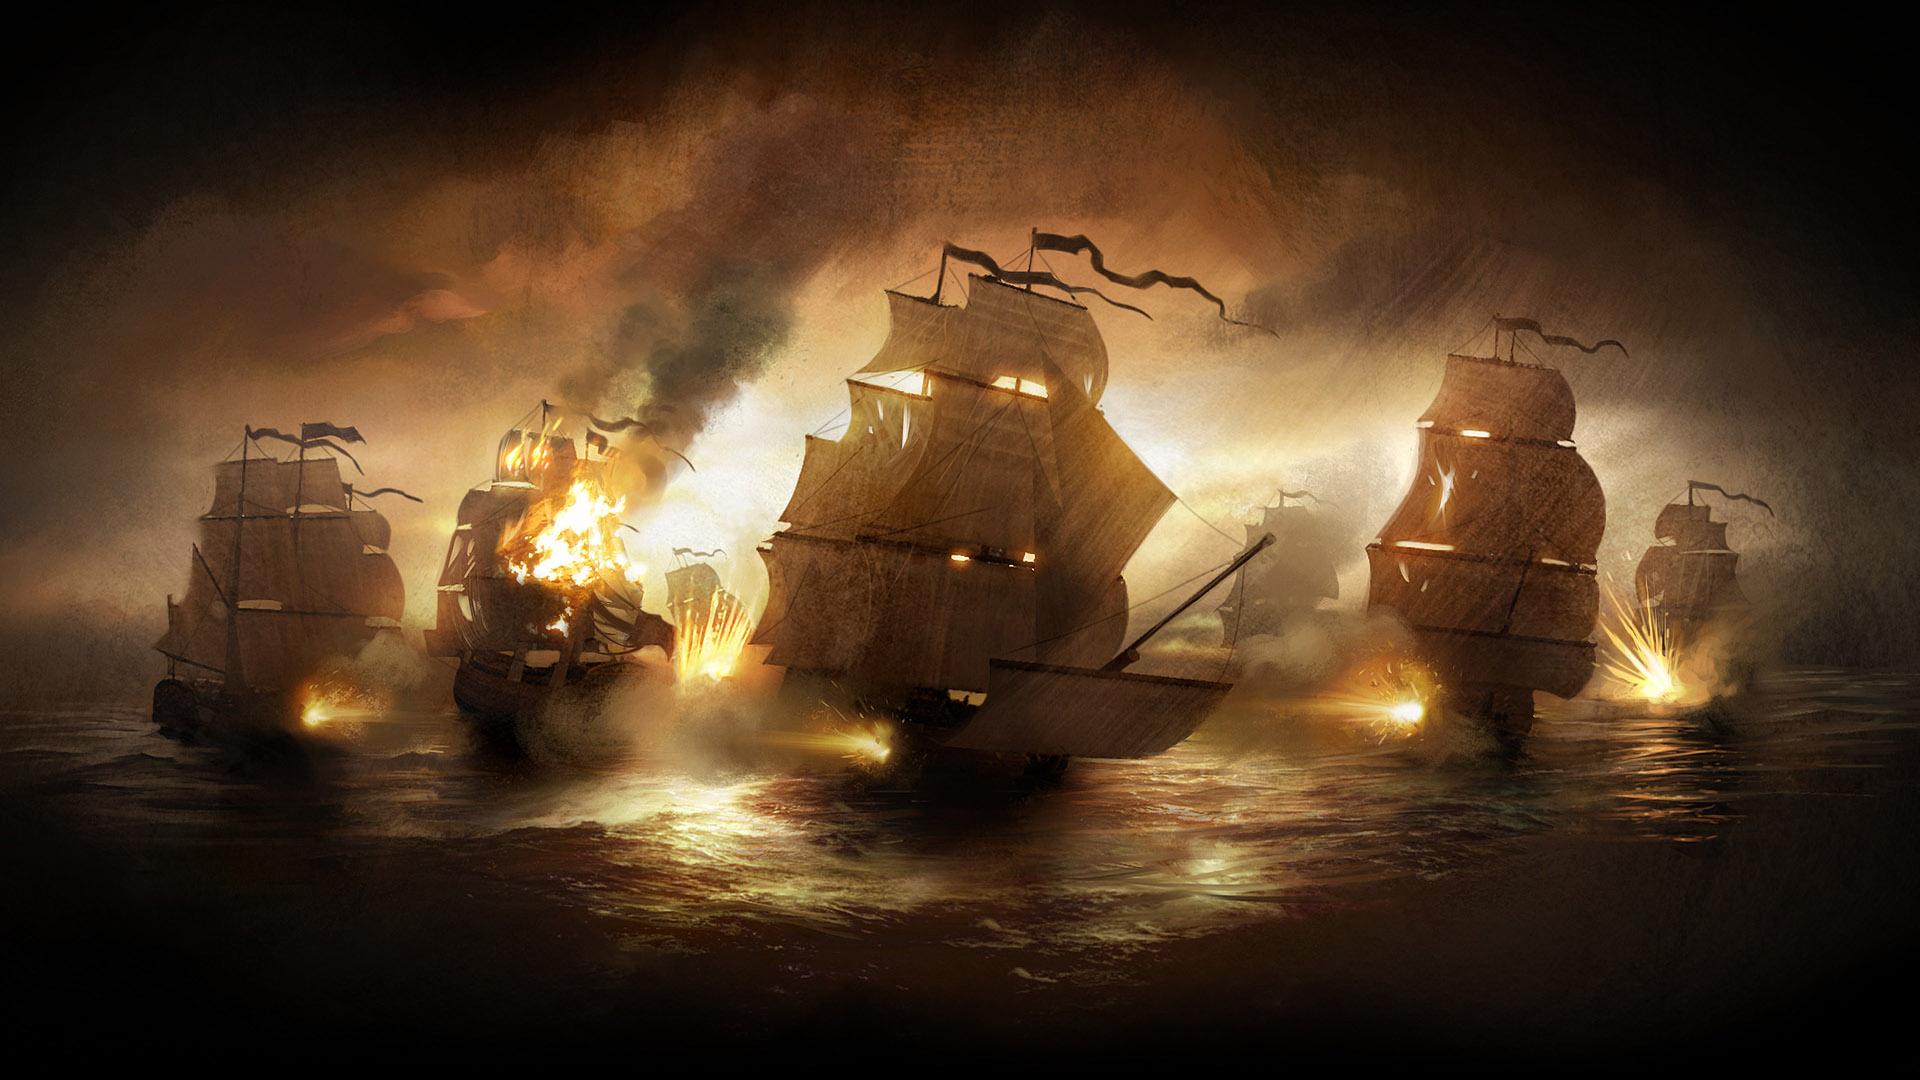 Amazing Pirate Ship High Quality Hd Wallpaper Desktop 1920x1080px